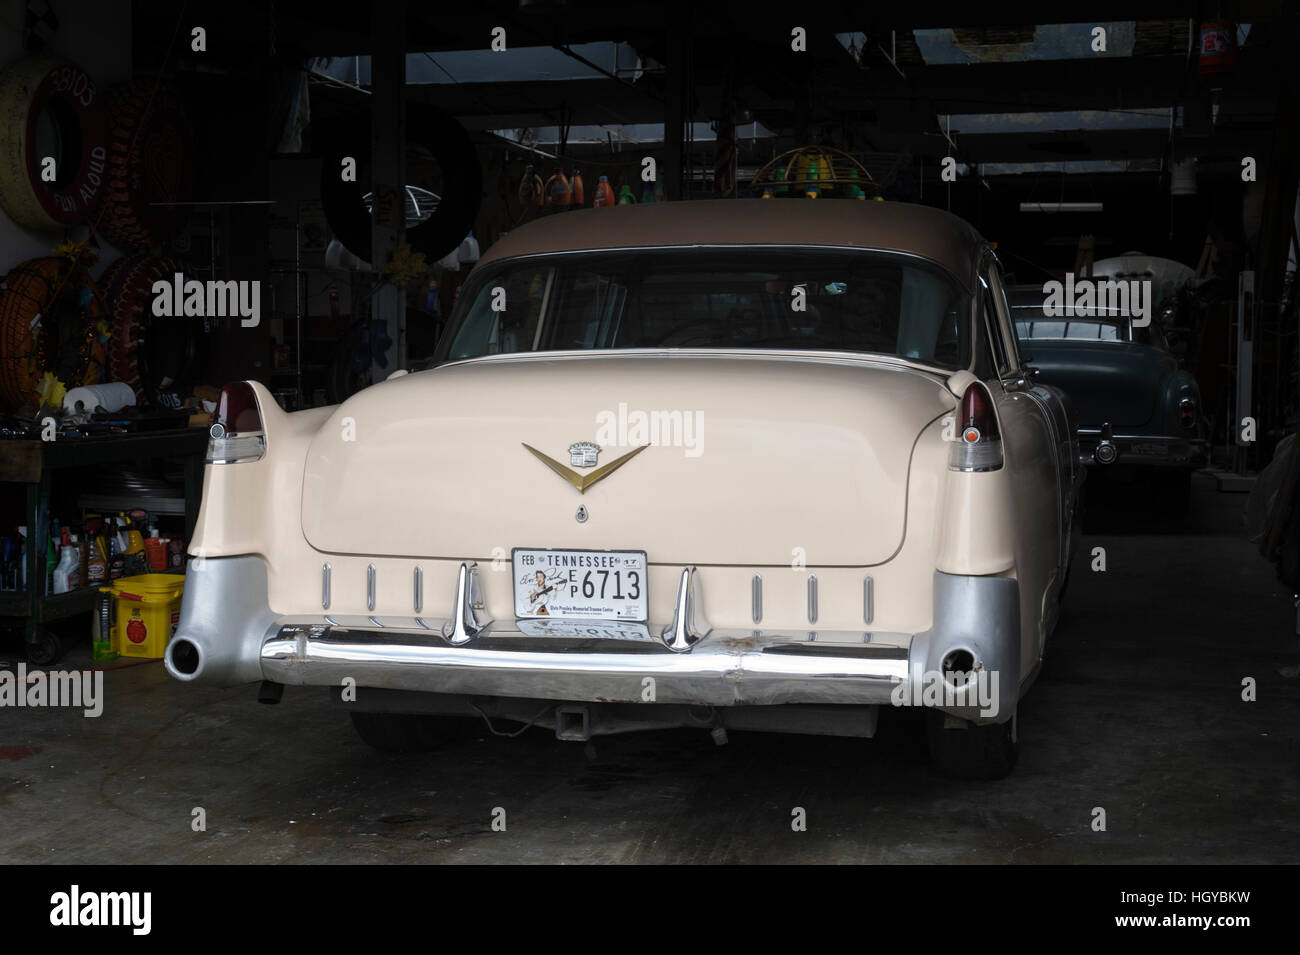 Cadillac Of Memphis >> Classic American Car Cadillac In Parking Garage Memphis